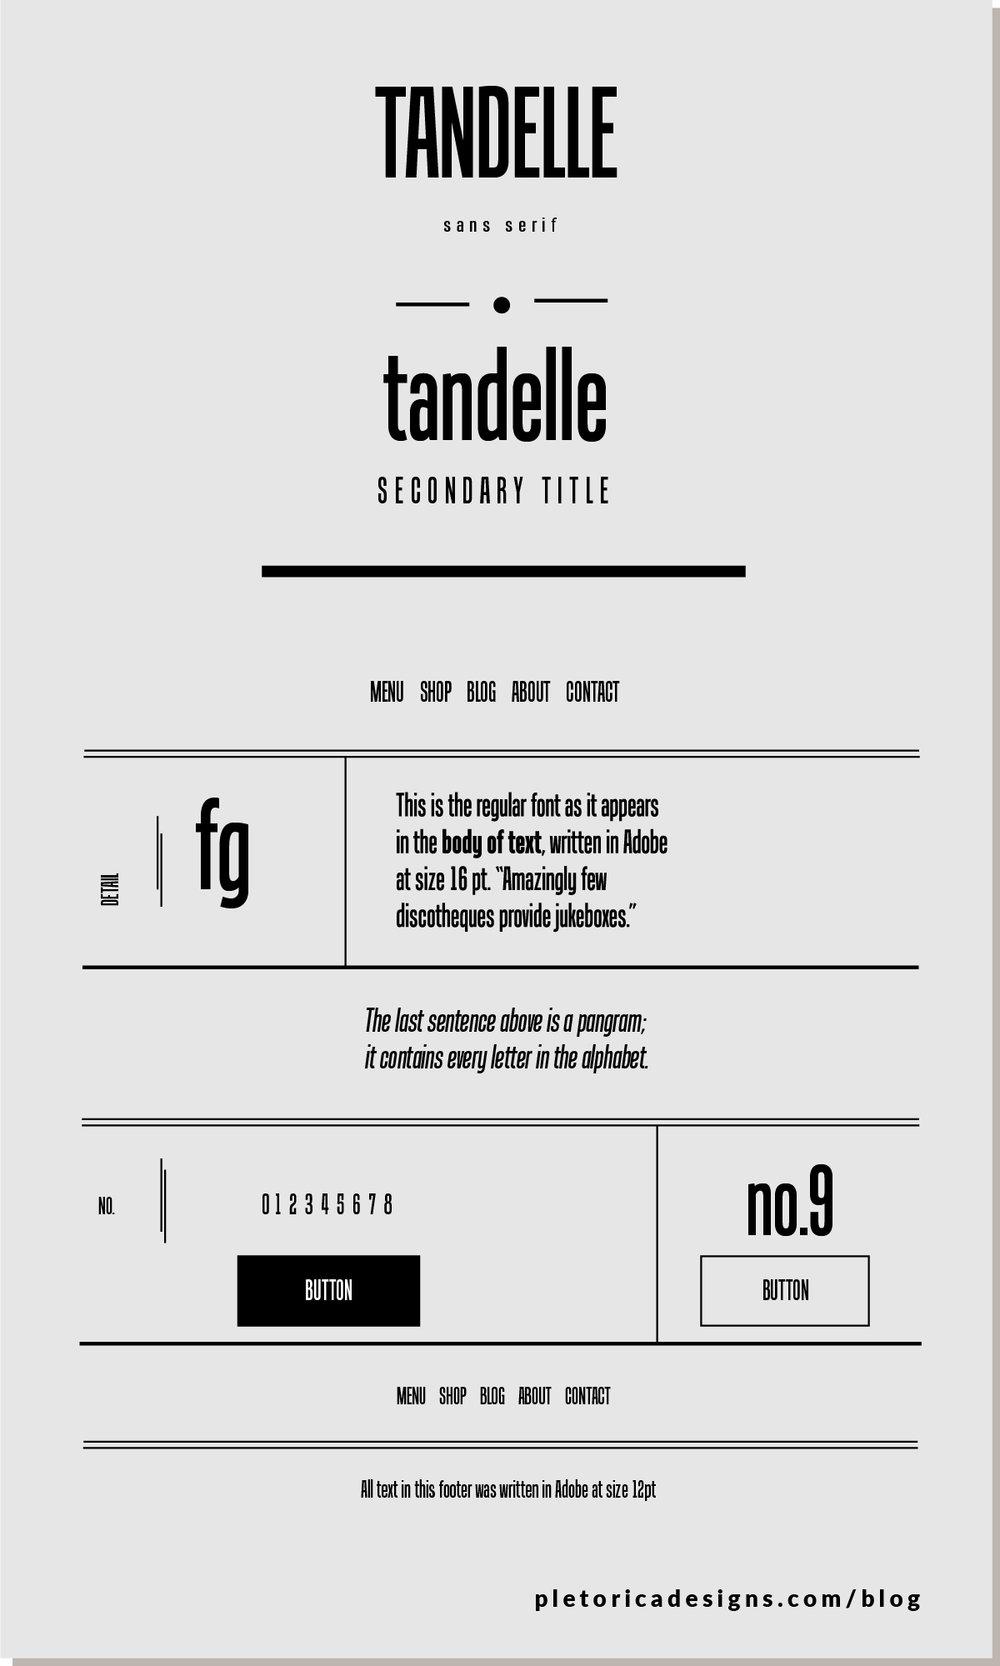 LET'S TYPE: Tandelle — PLETÓRICA DESIGNS